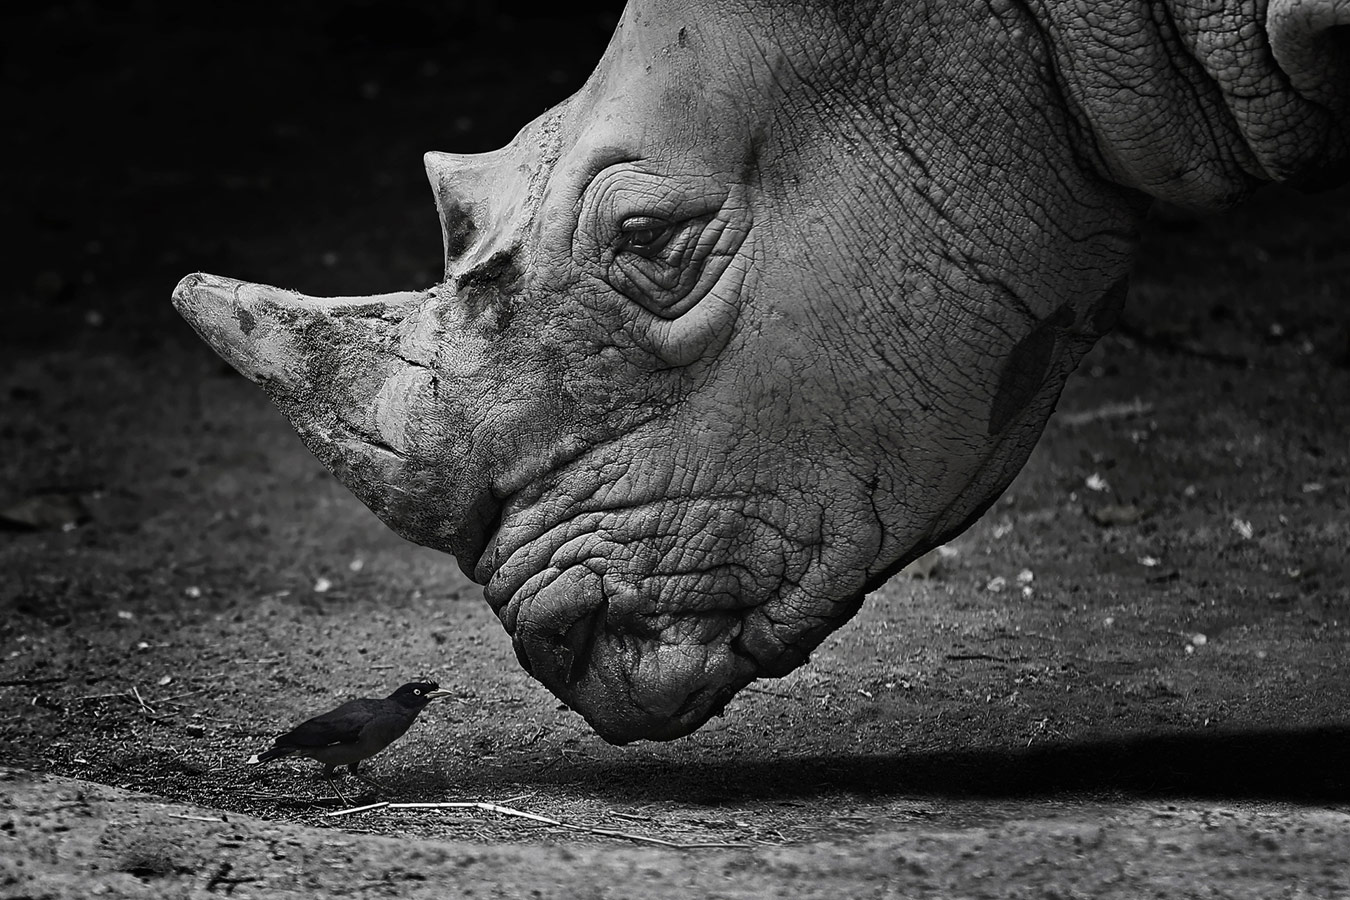 Dialog, © Alla Sokolova, France, Black and White Nomination, 1 place, 35AWARDS Photo Contest